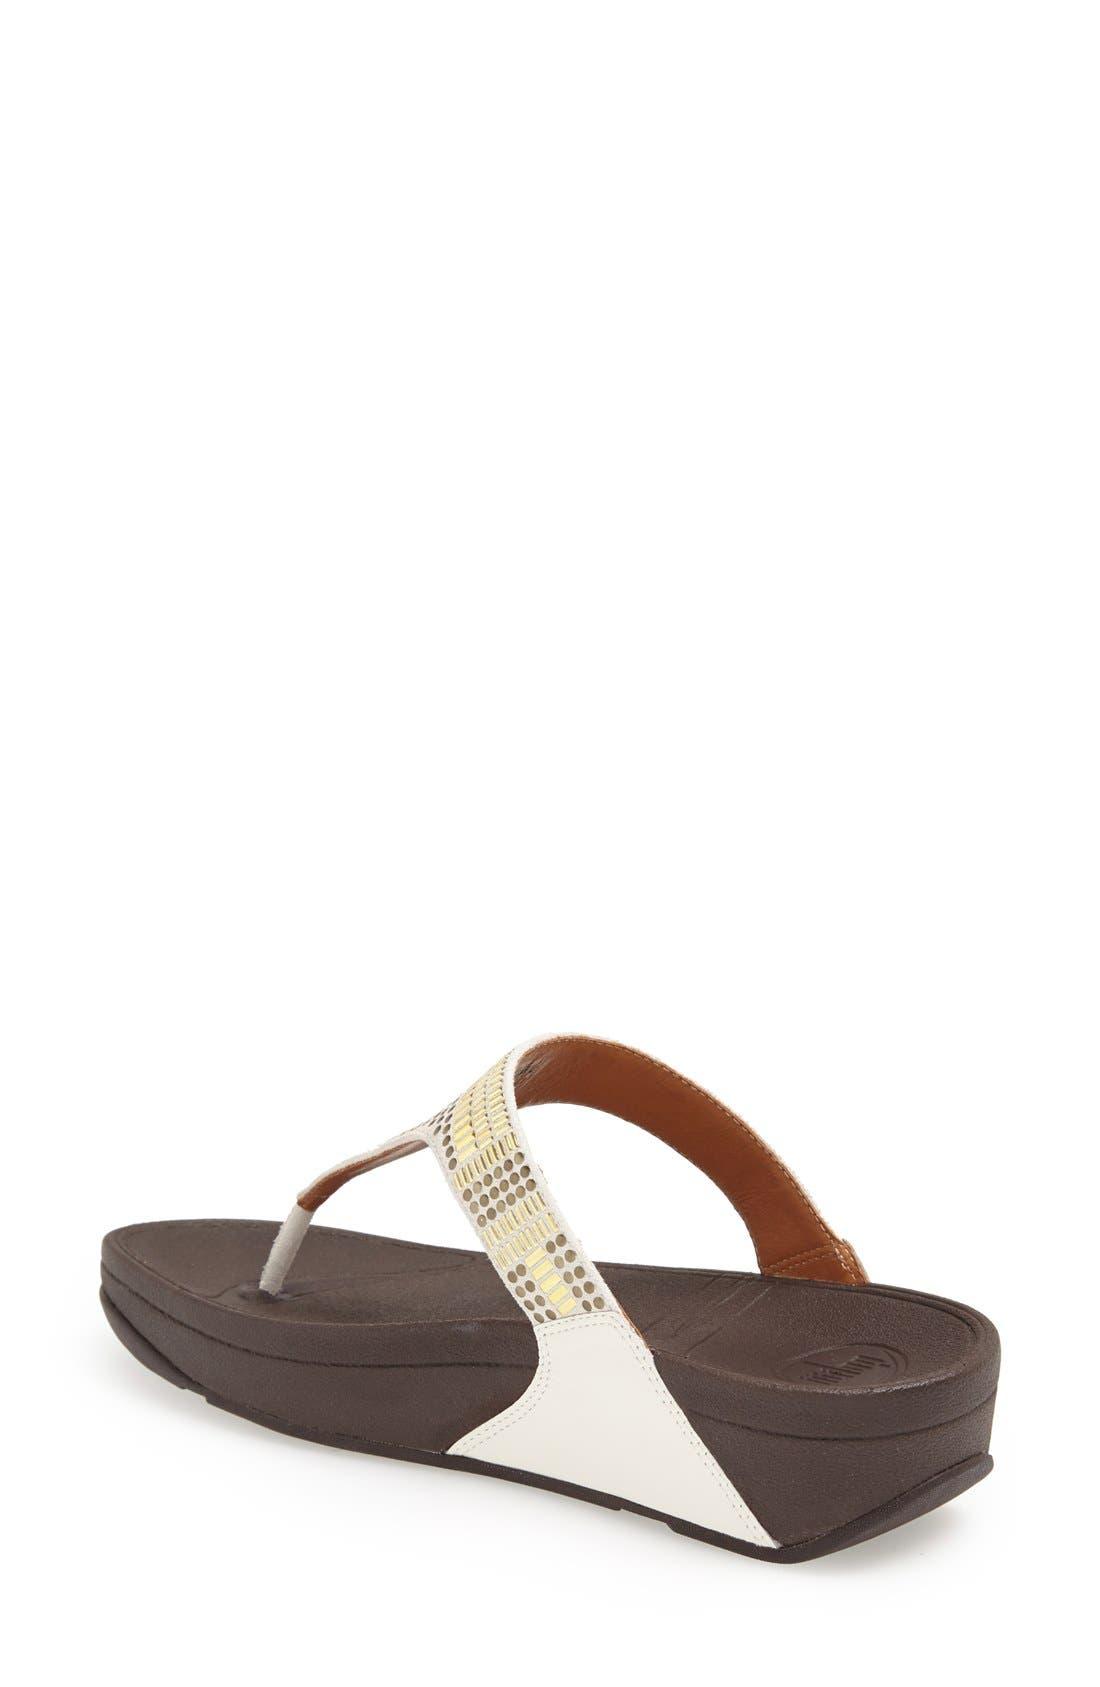 Alternate Image 2  - FitFlop 'Aztek Chada' Sandal